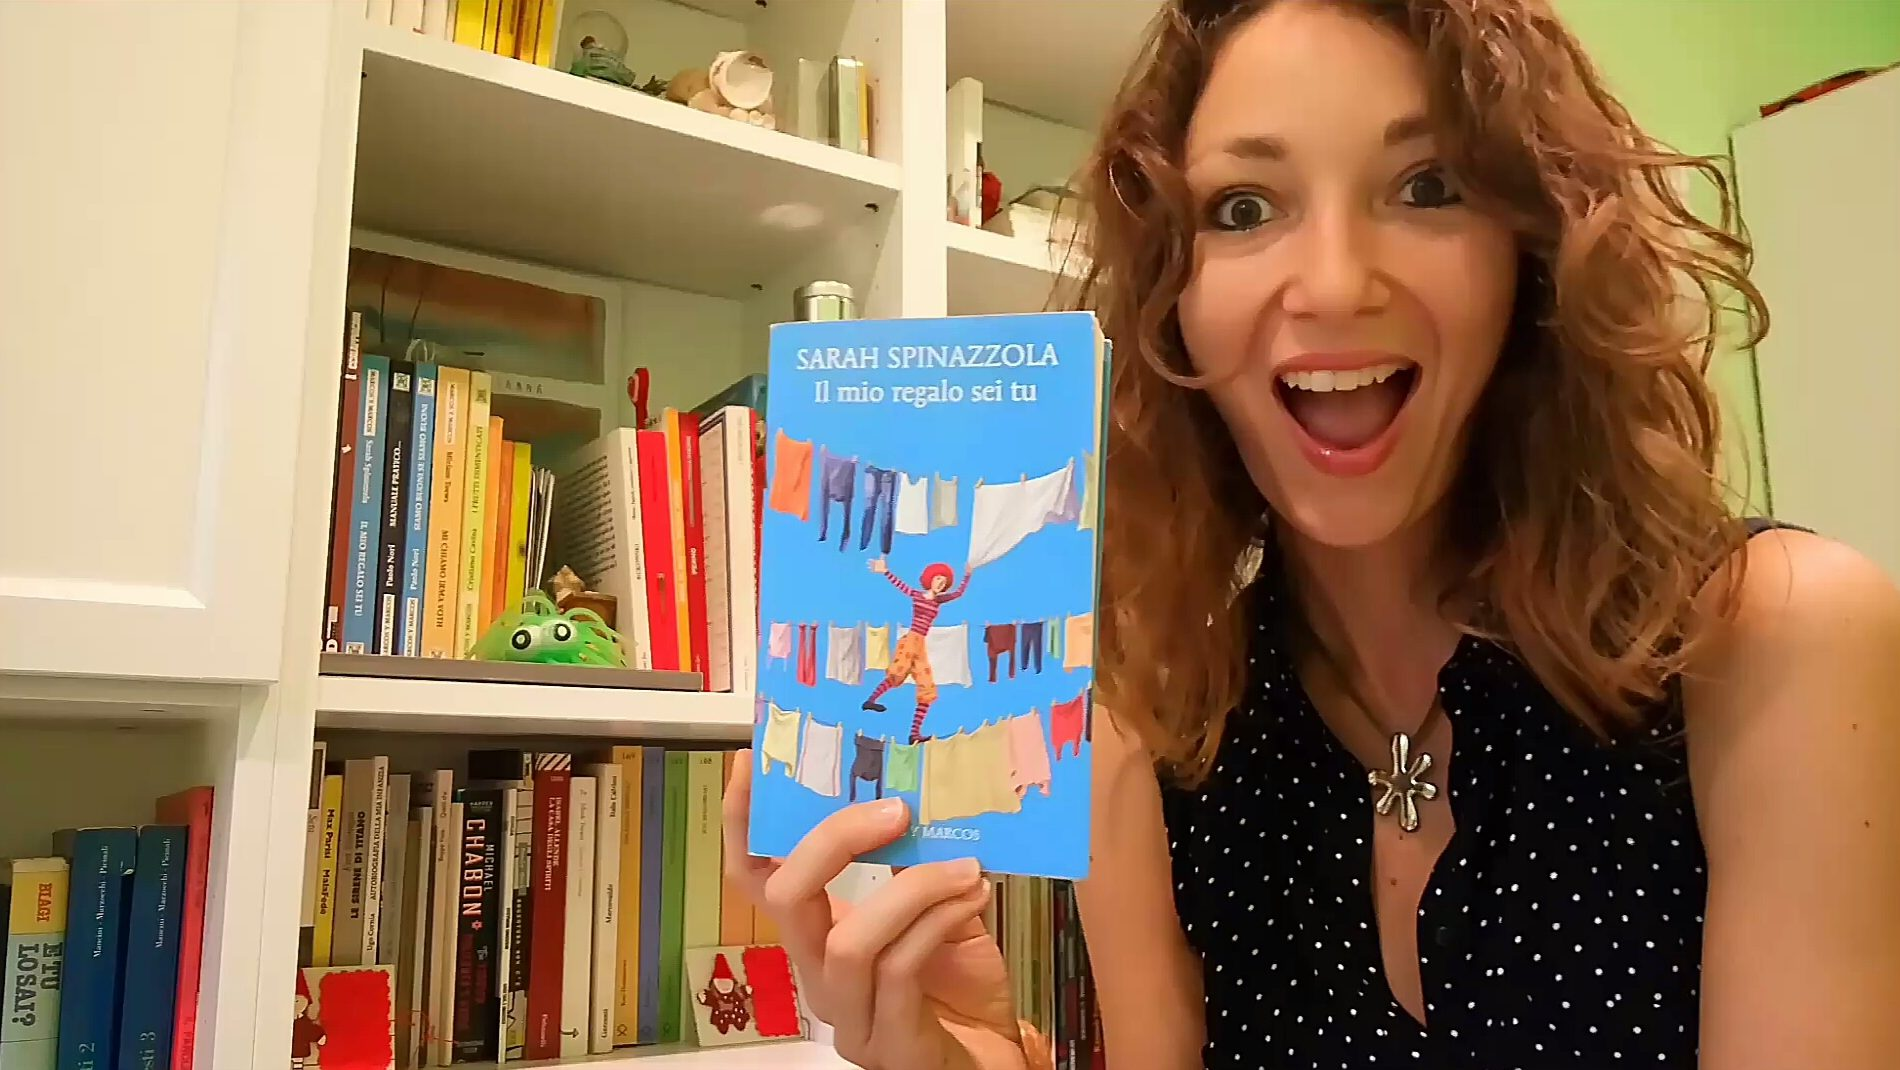 Sarah Spinazzola, Il mio regalo sei tu romanzo, Marcos y Marcos